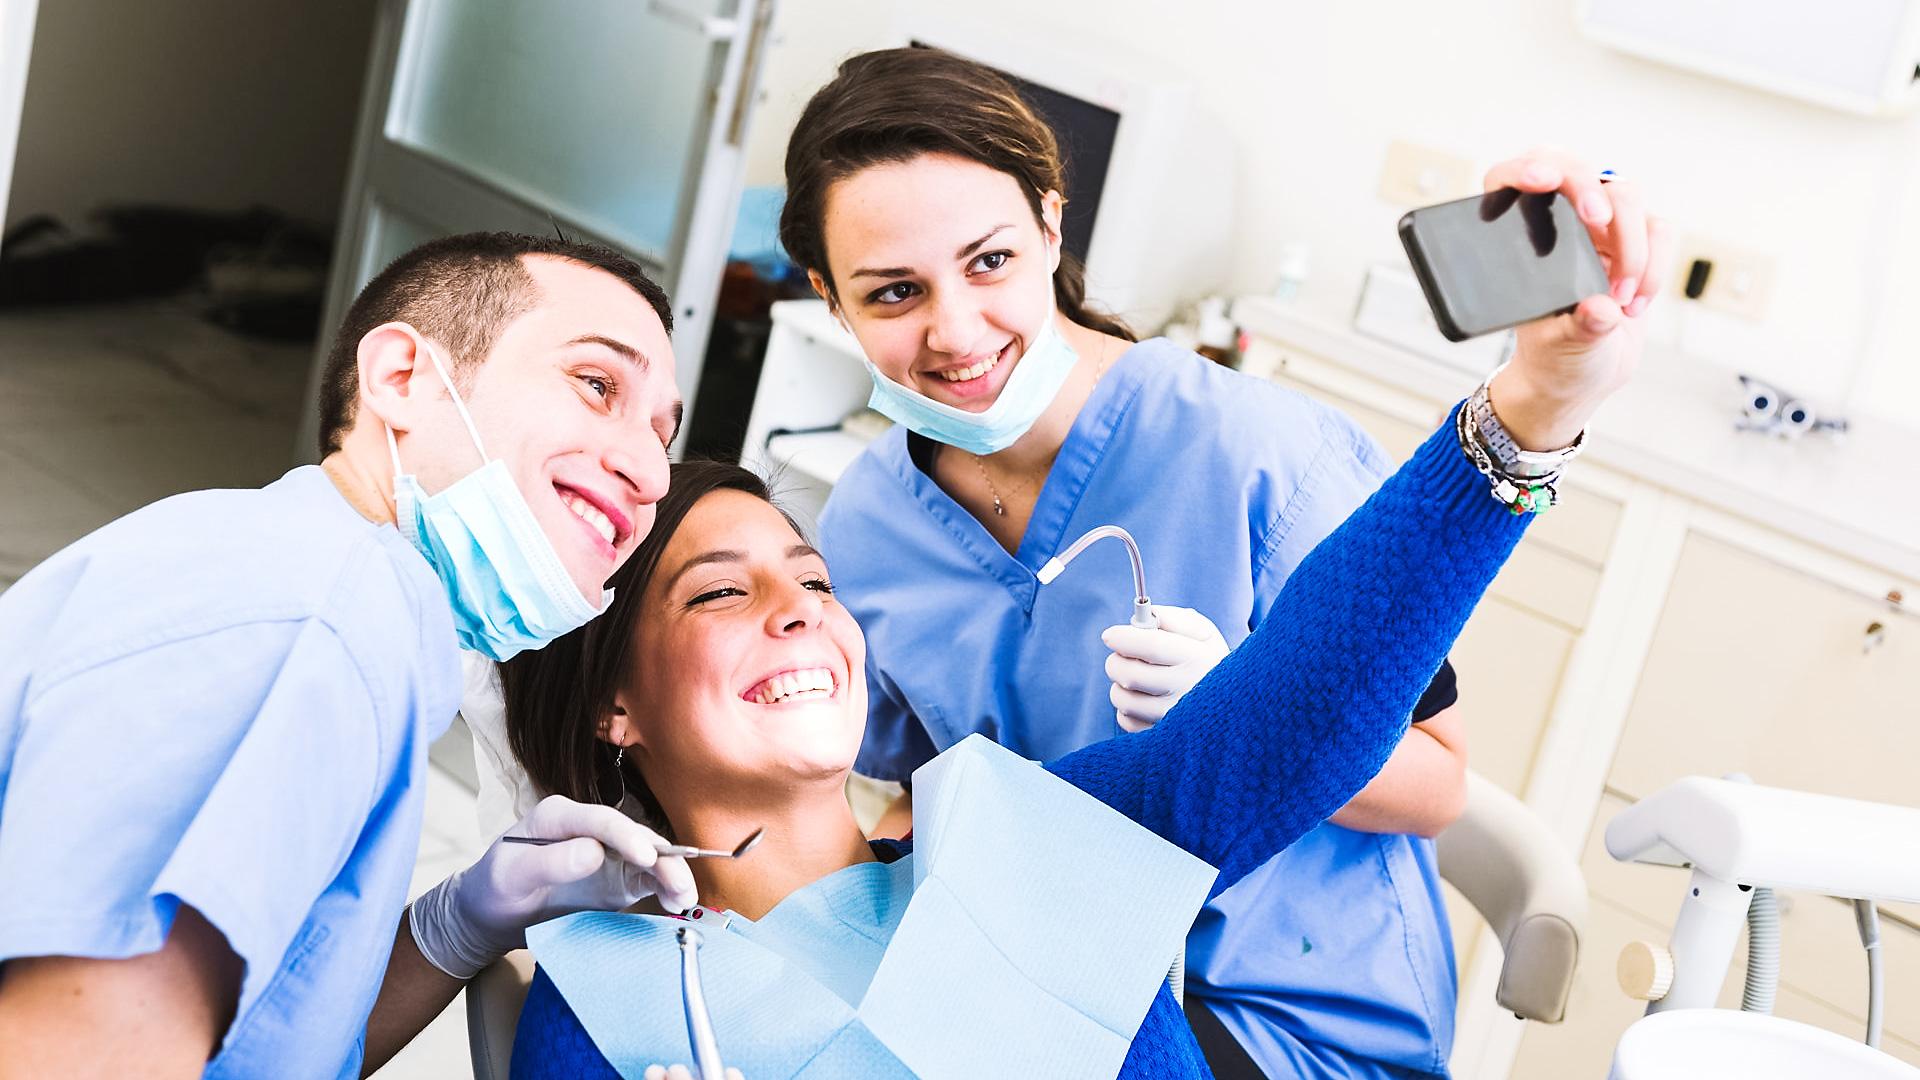 они новые картинки про стоматолога зависимости причин